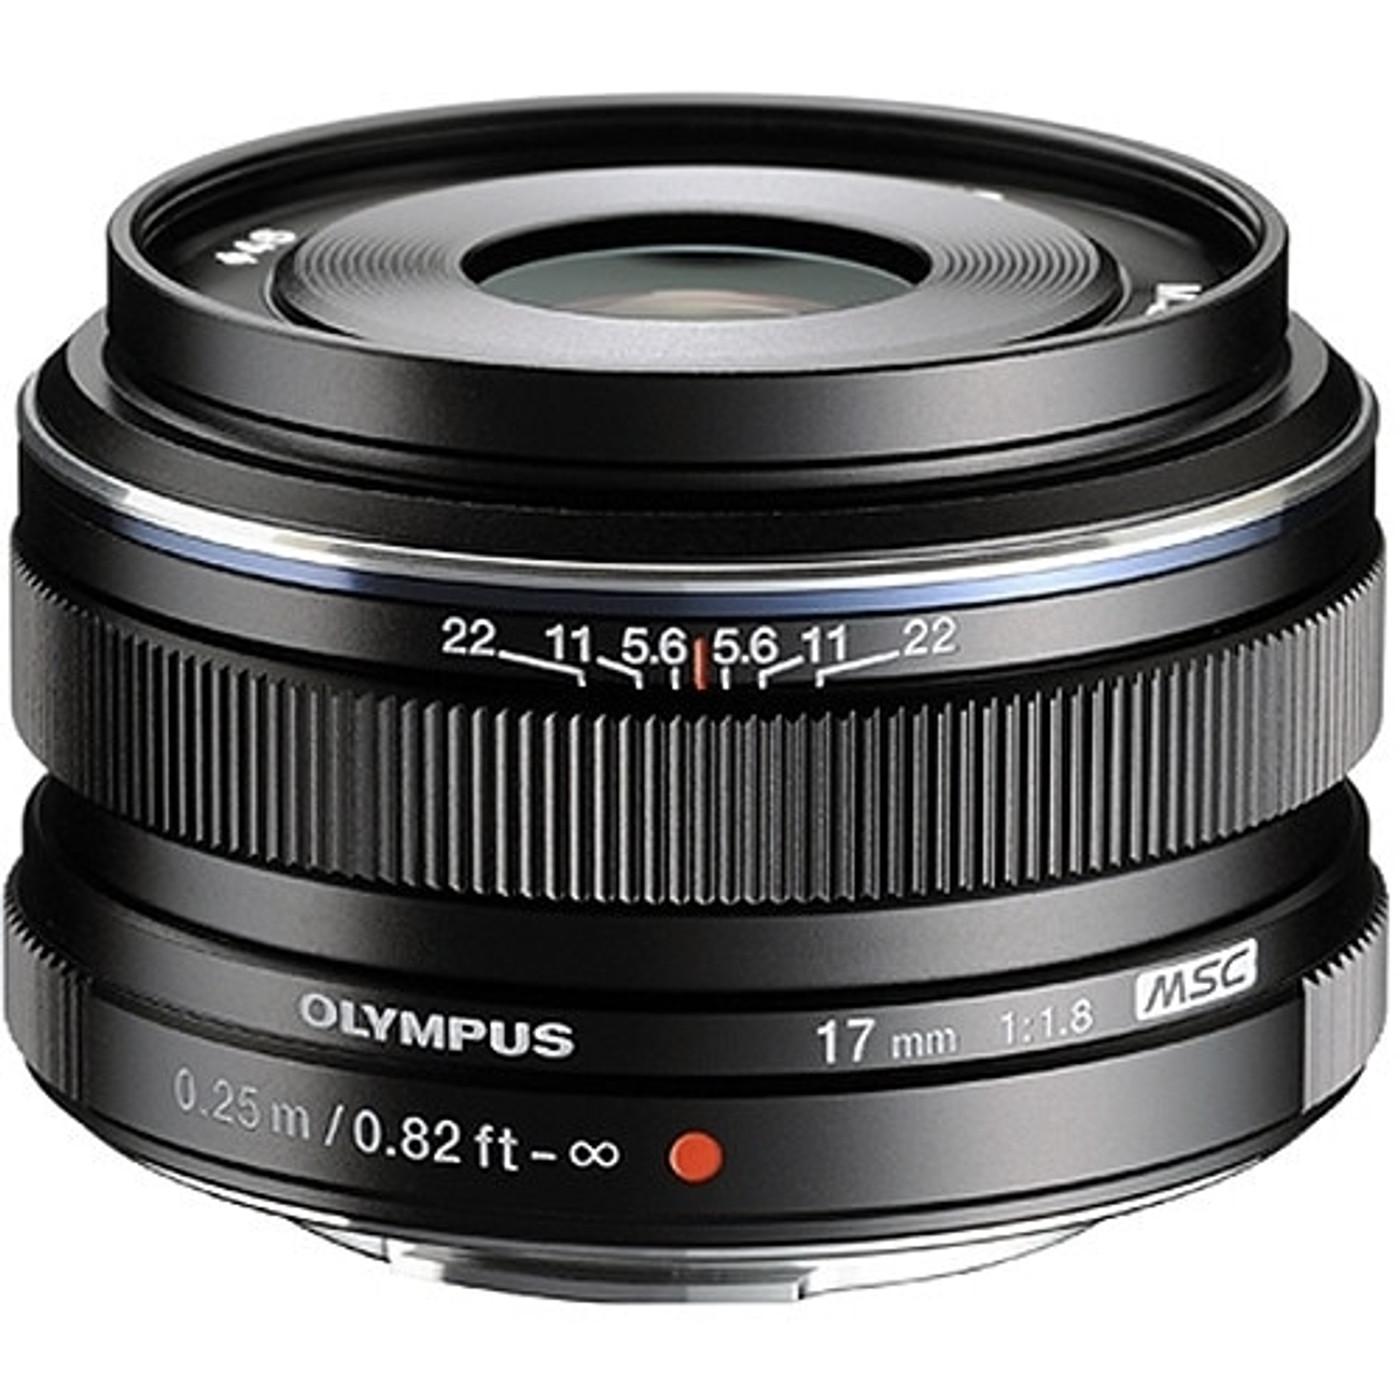 Olympus M.Zuiko Digital 17mm f1.8 Lens (Black)